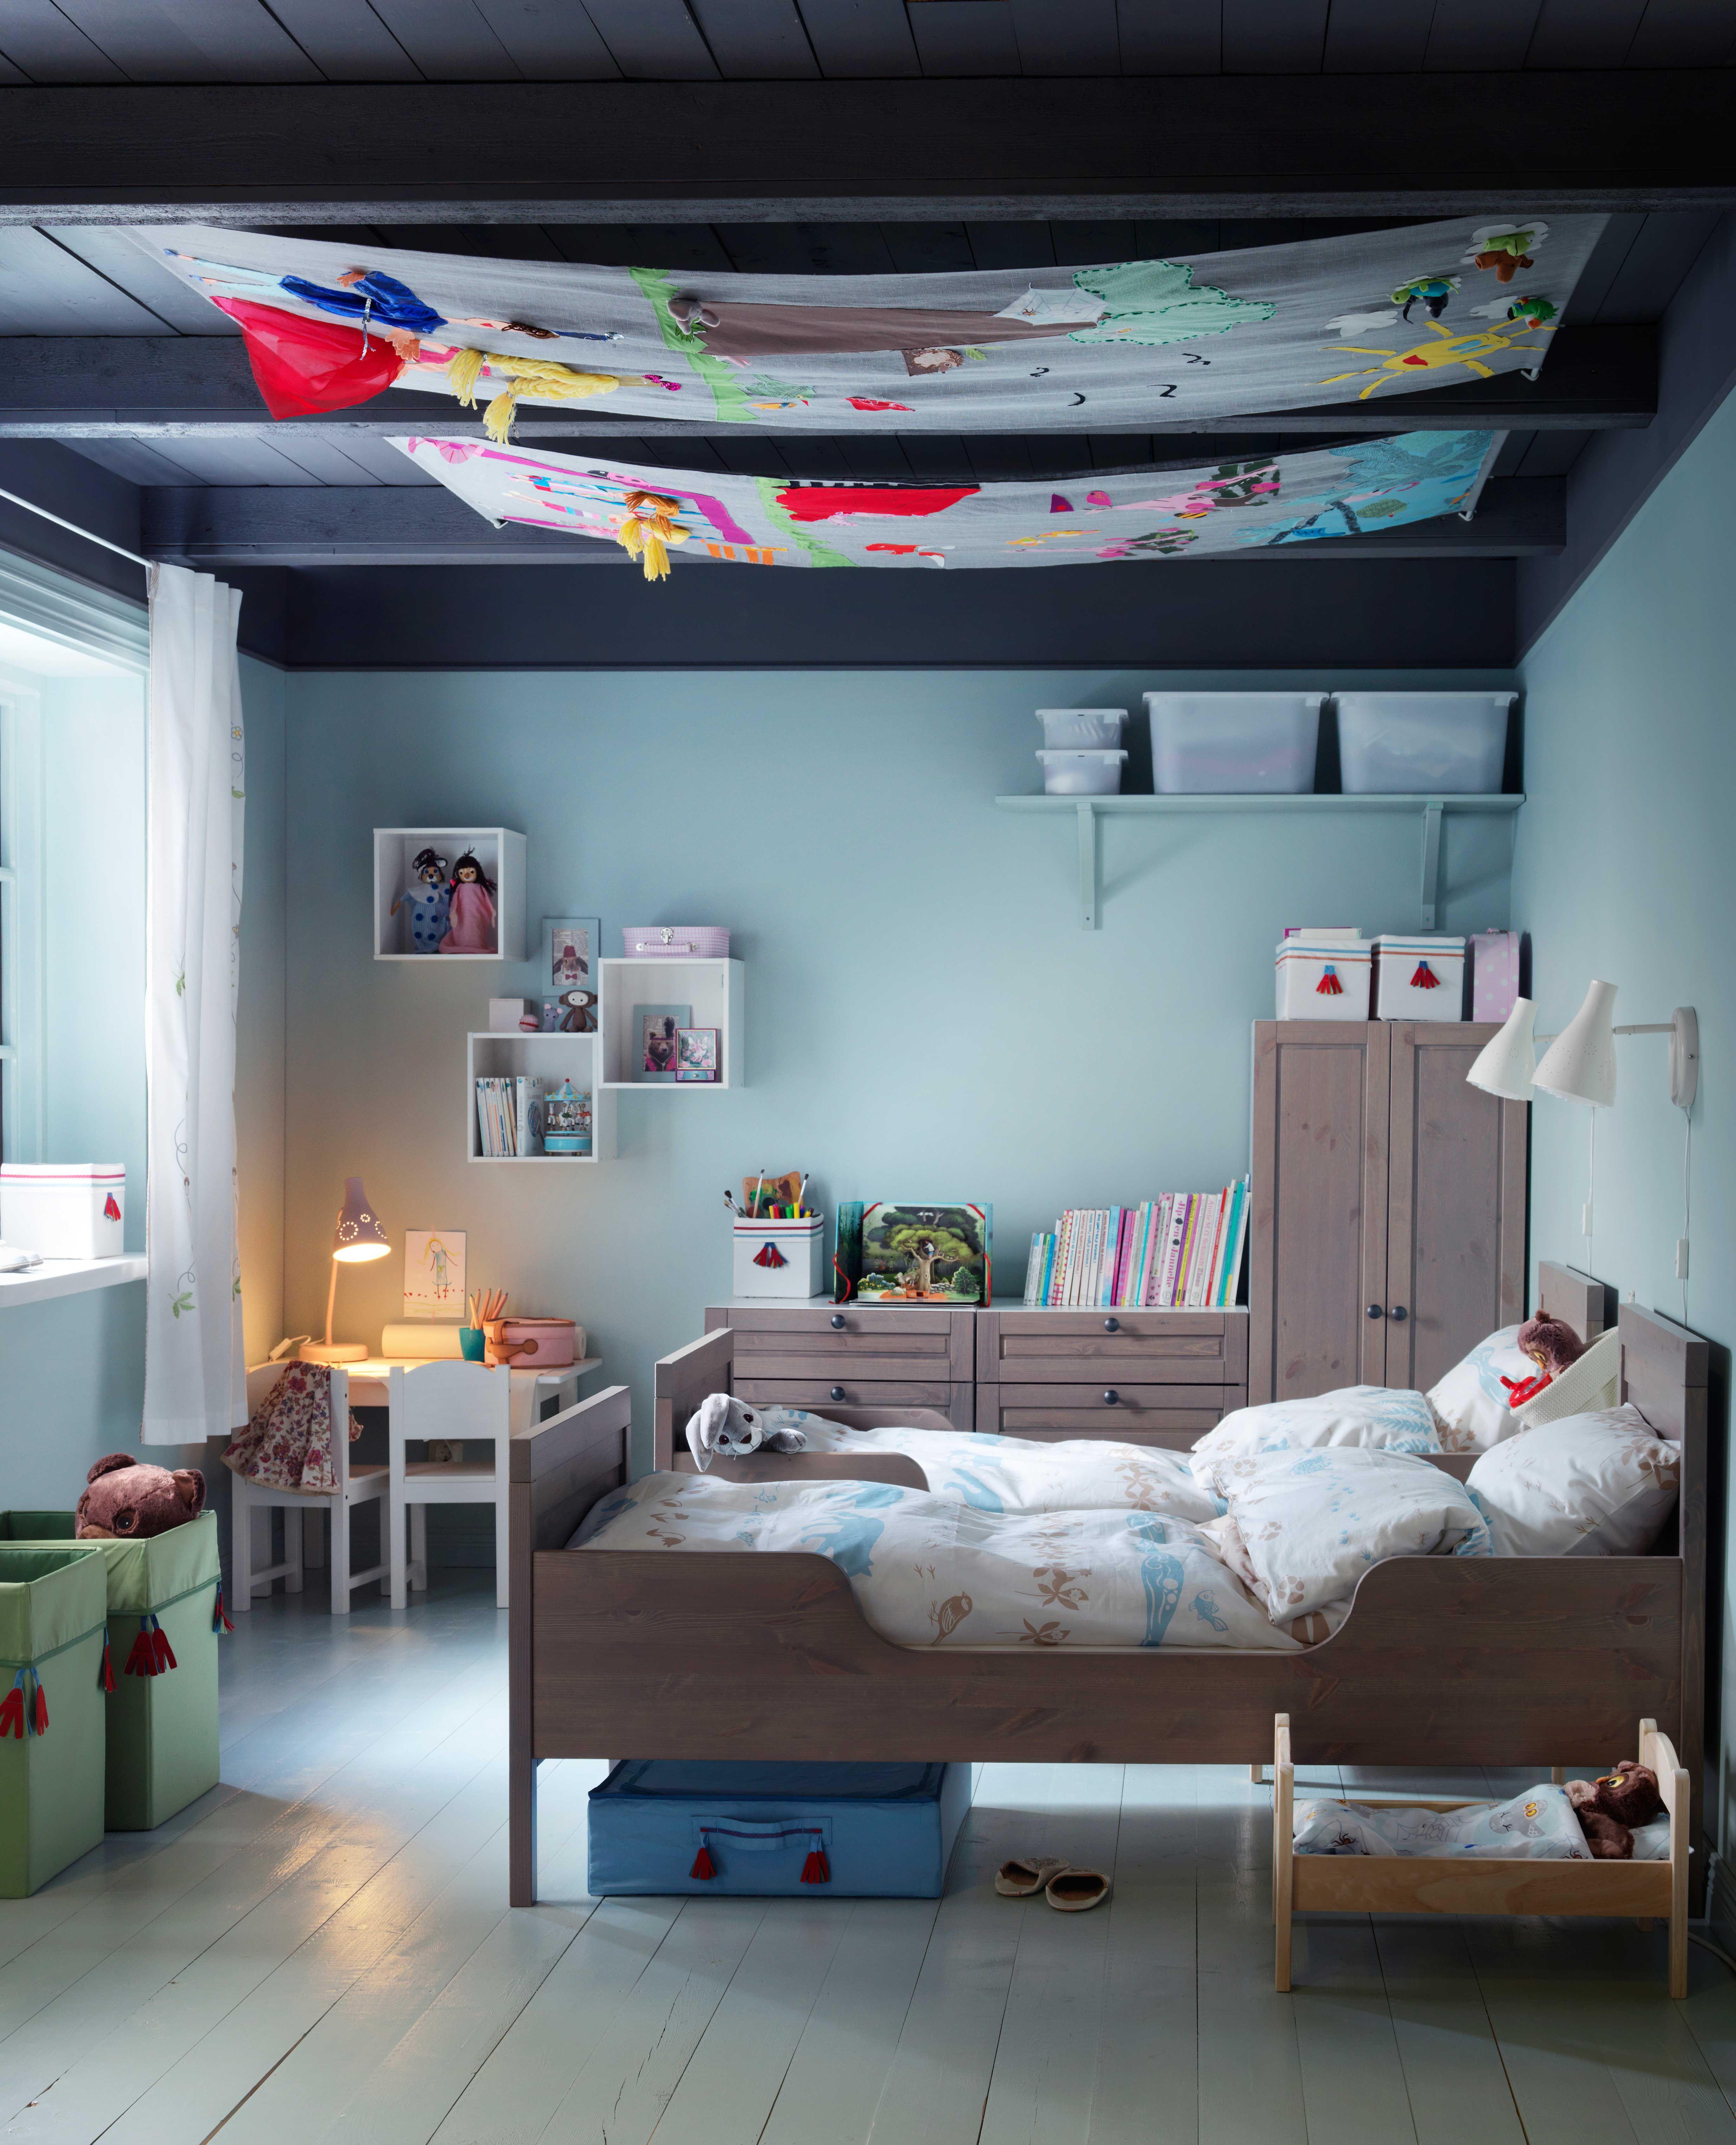 Ikea Kinderzimmer Inspiration ikea österreich inspiration textilien kinderzimmer